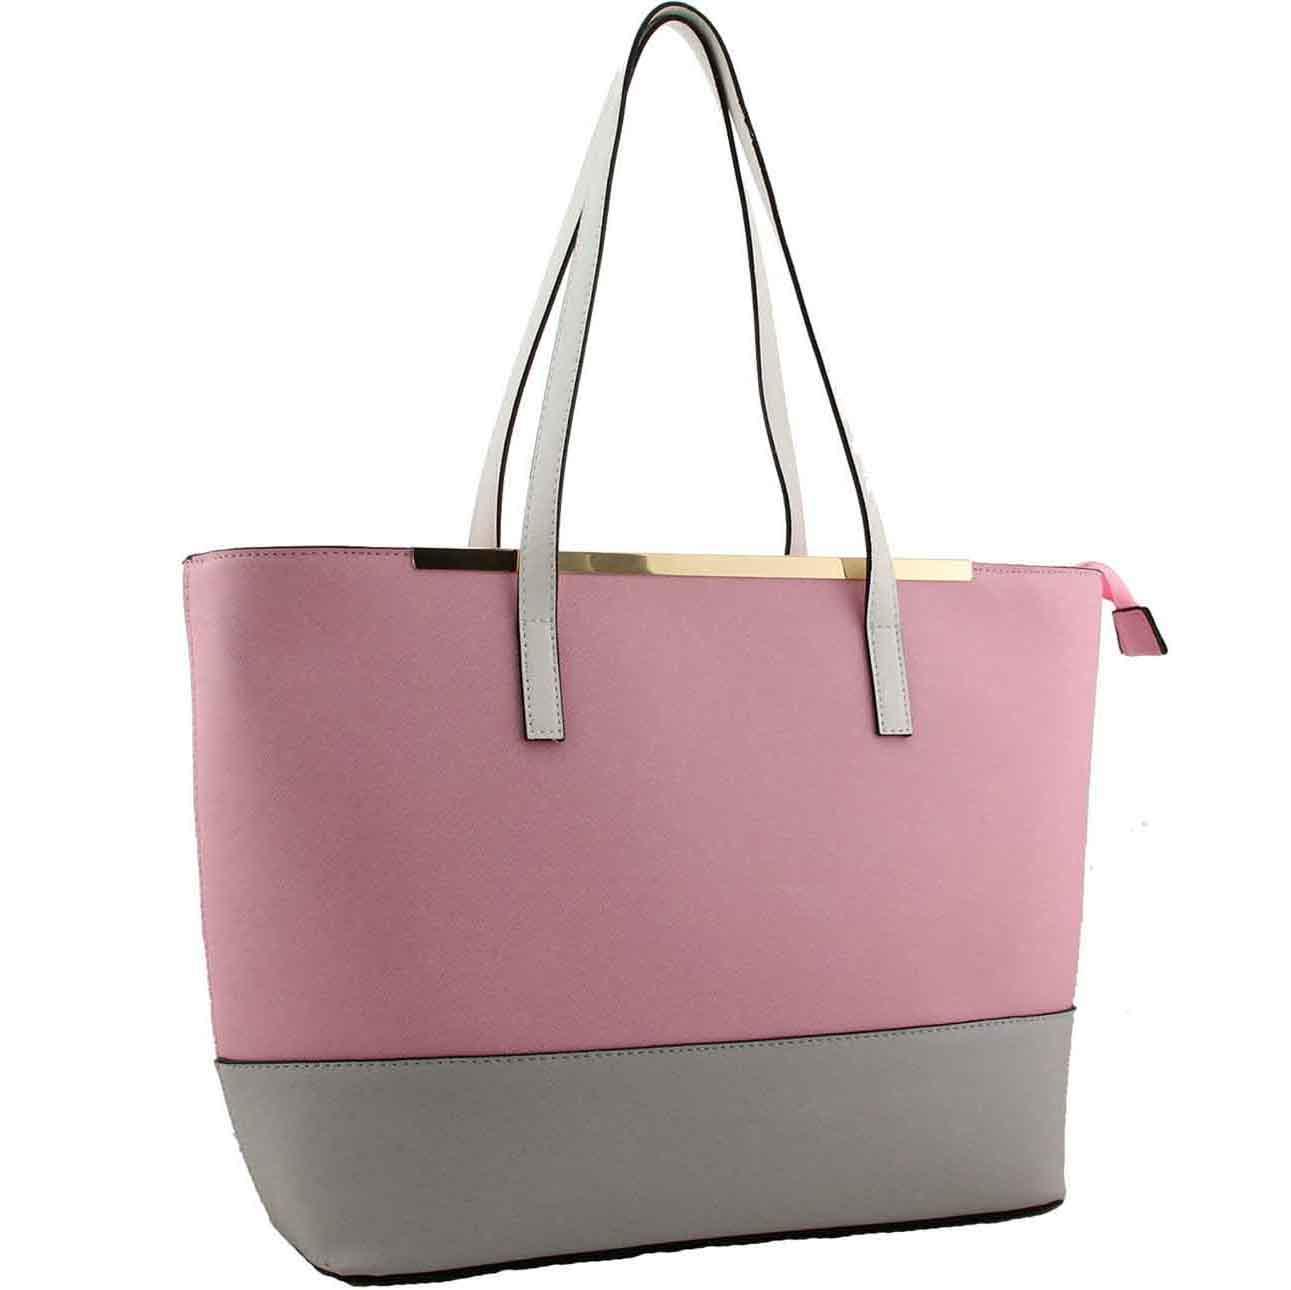 bfc9ca225d516 H1656 - Zenobia fashion designer tote pink